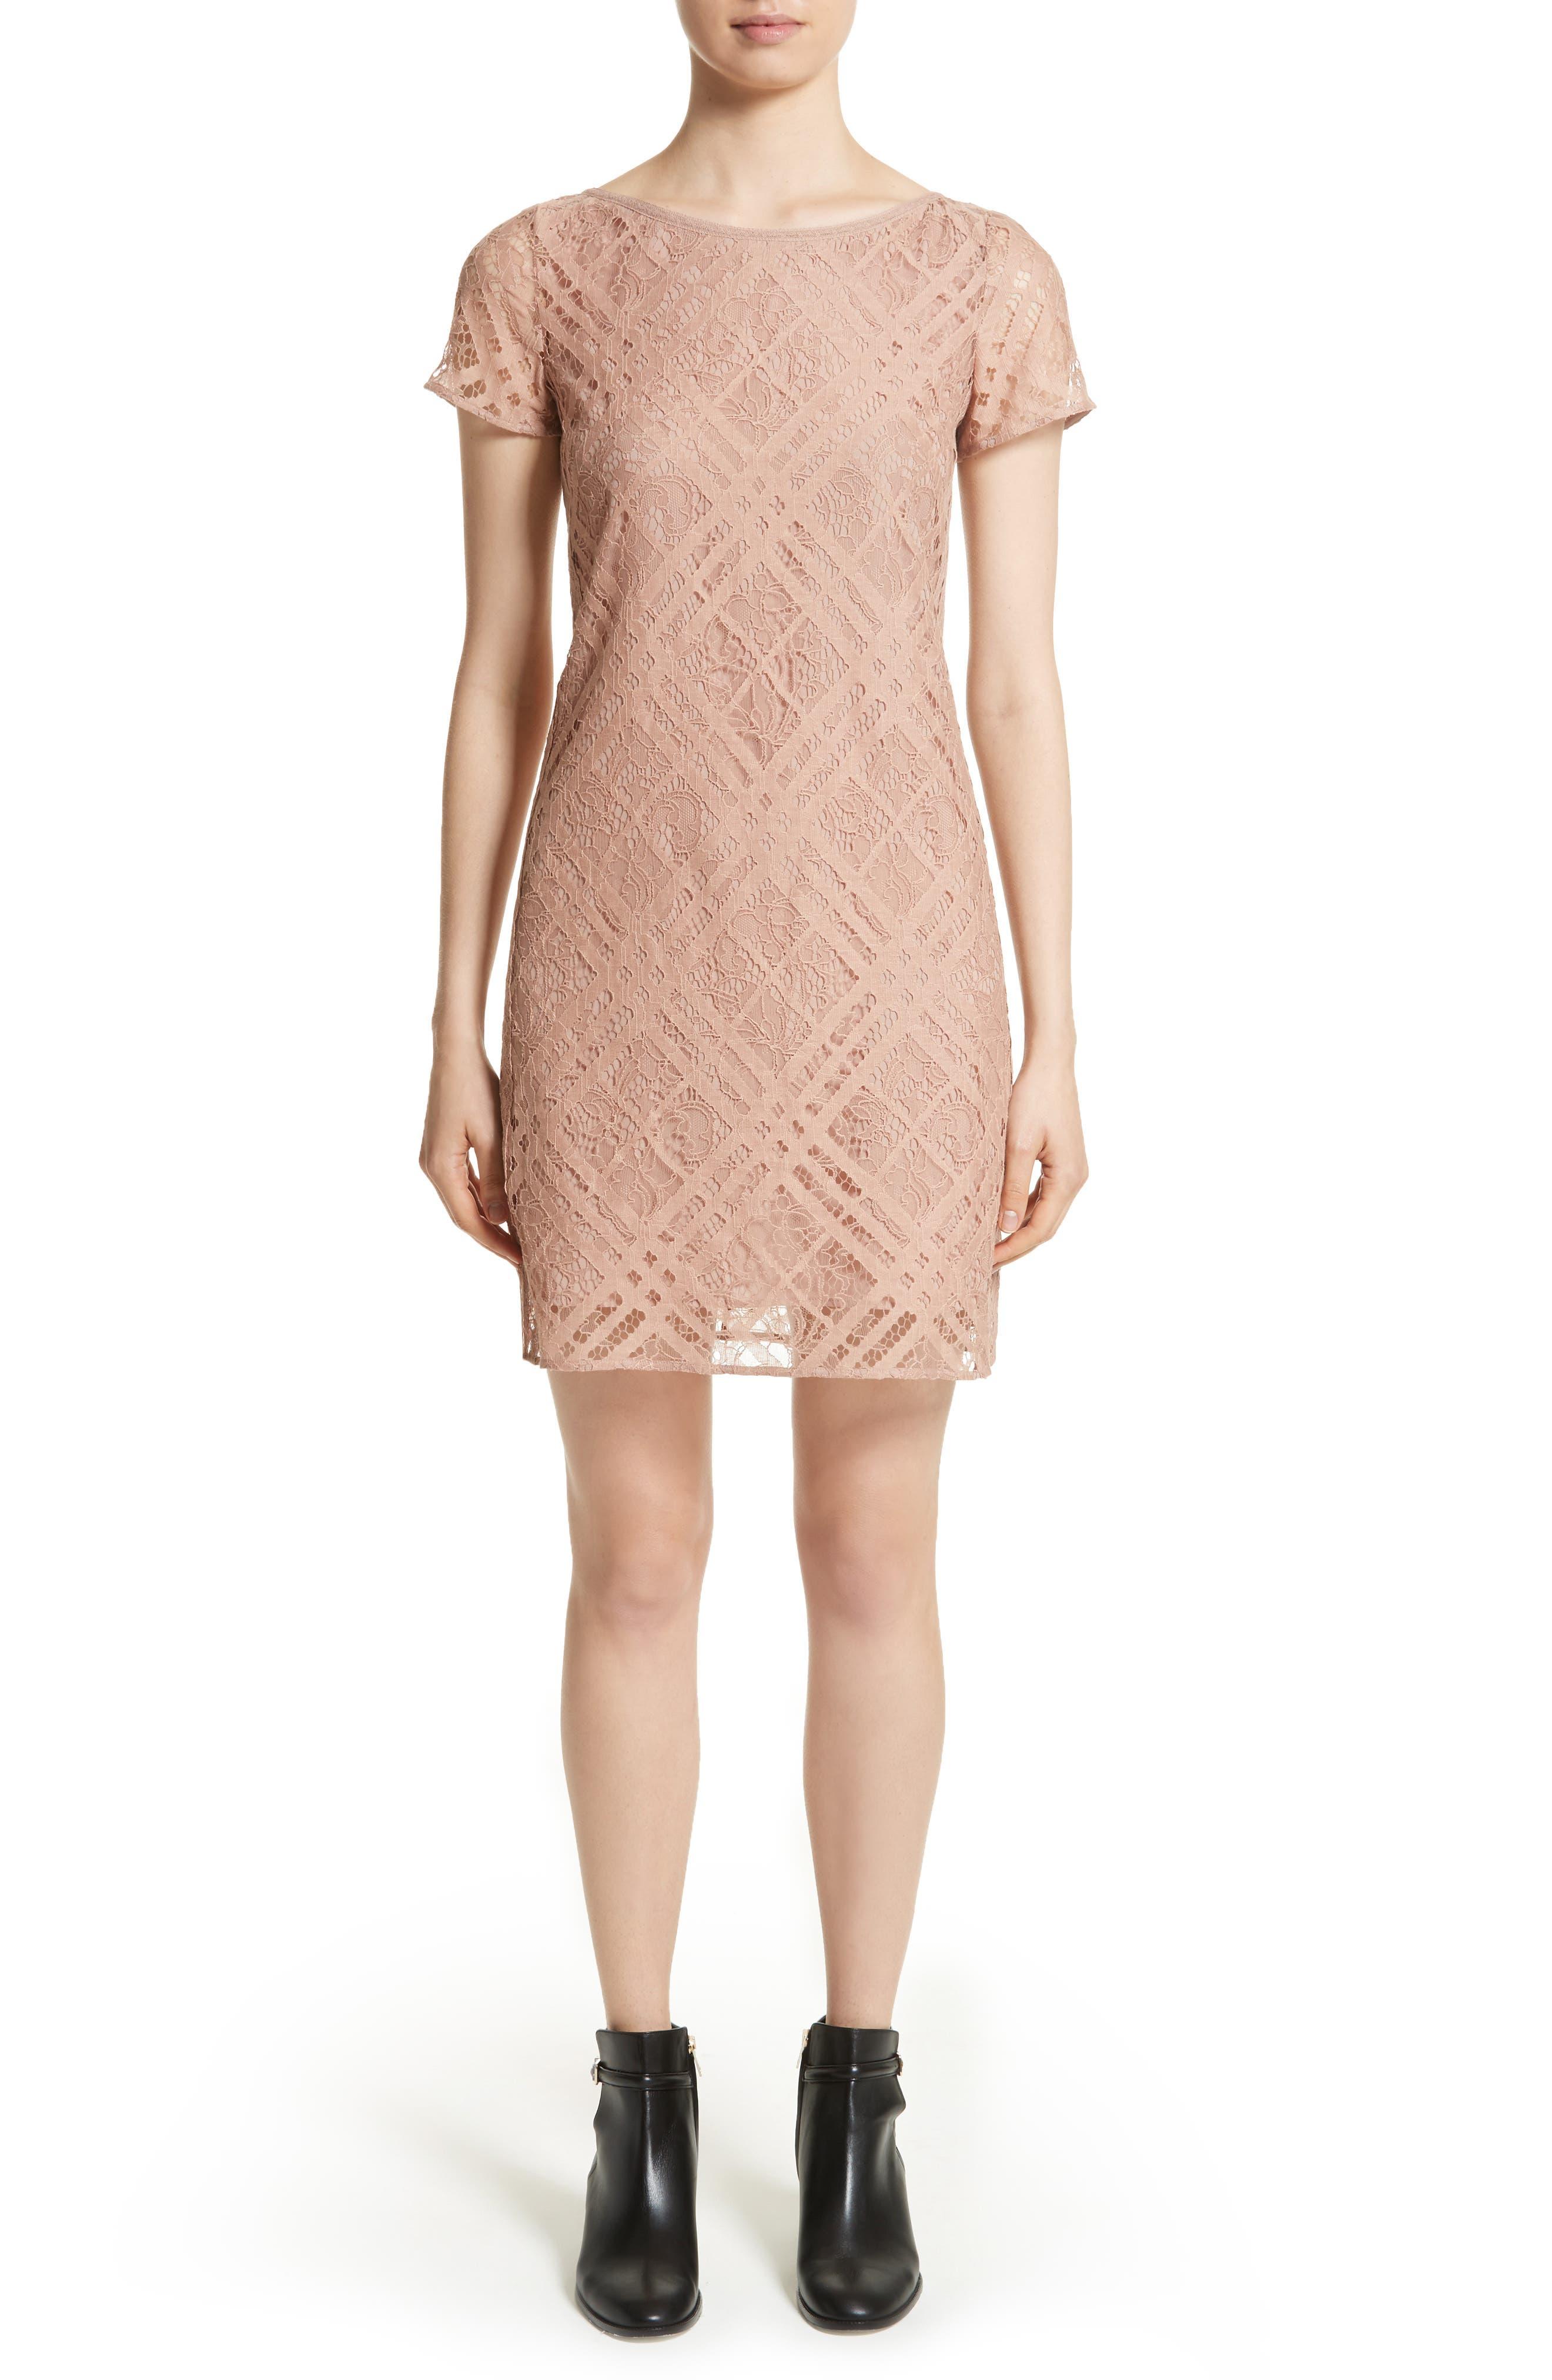 Burberry Liberty Check Lace Shift Dress